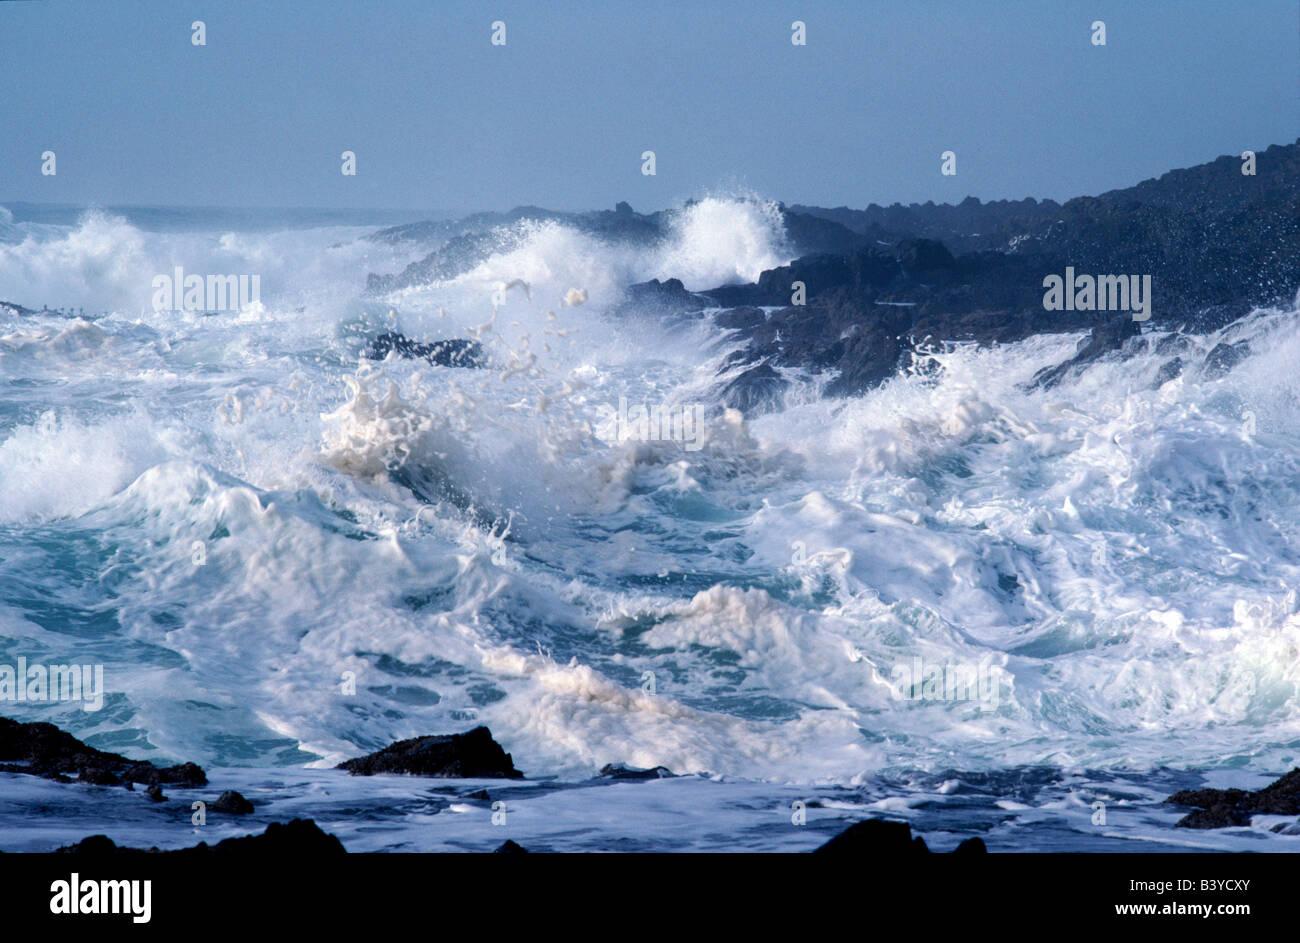 High waves during storm at Devil's Churn.  Oregon coast. Stock Photo